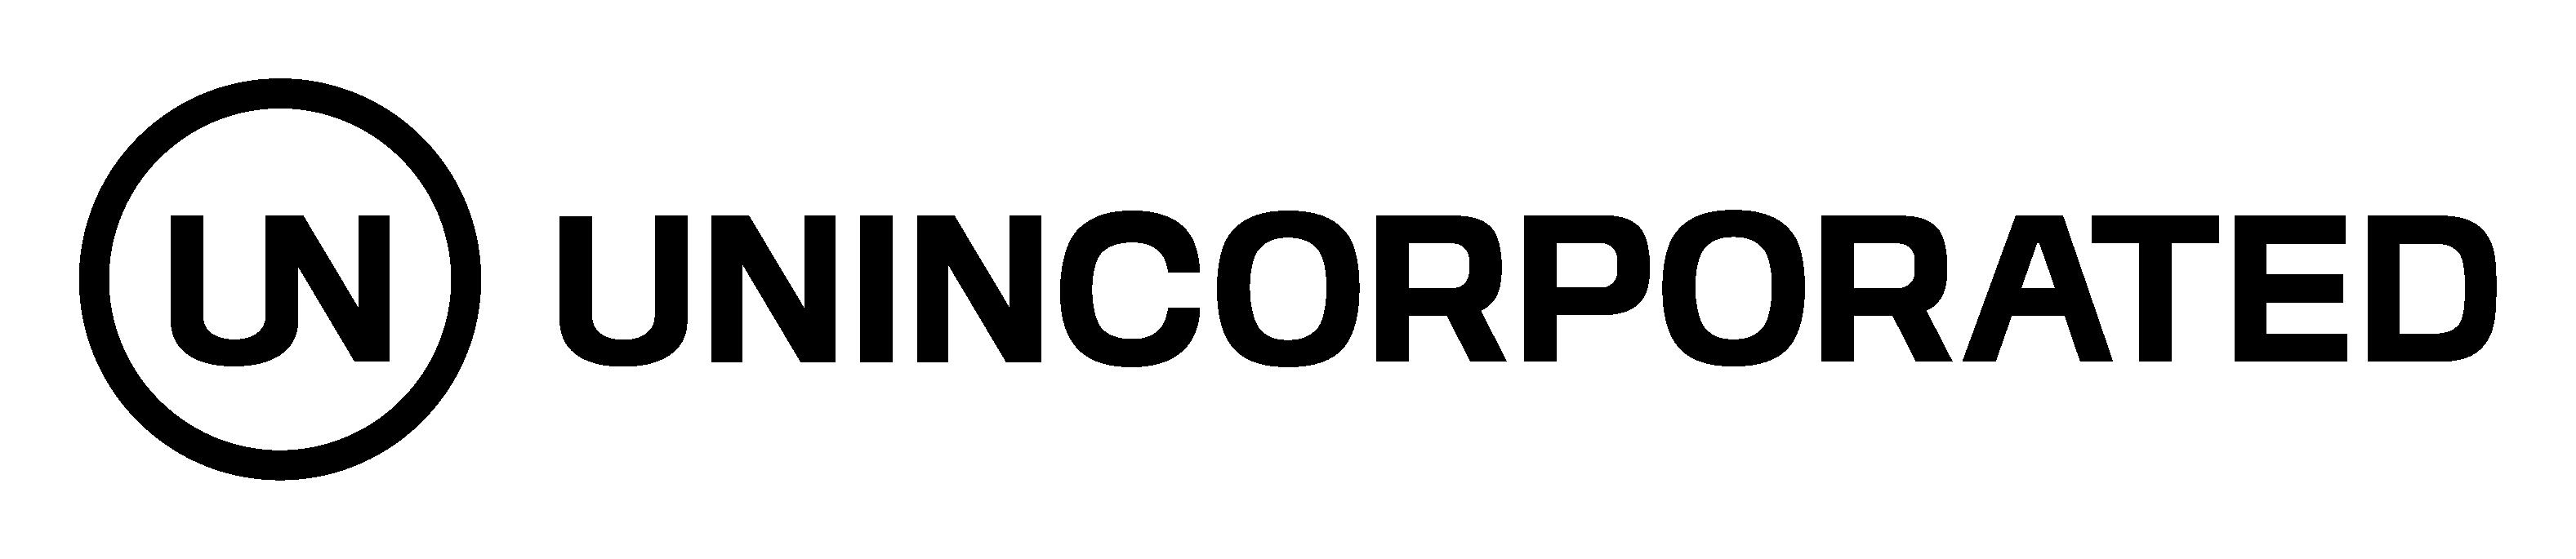 Unincorporated logo